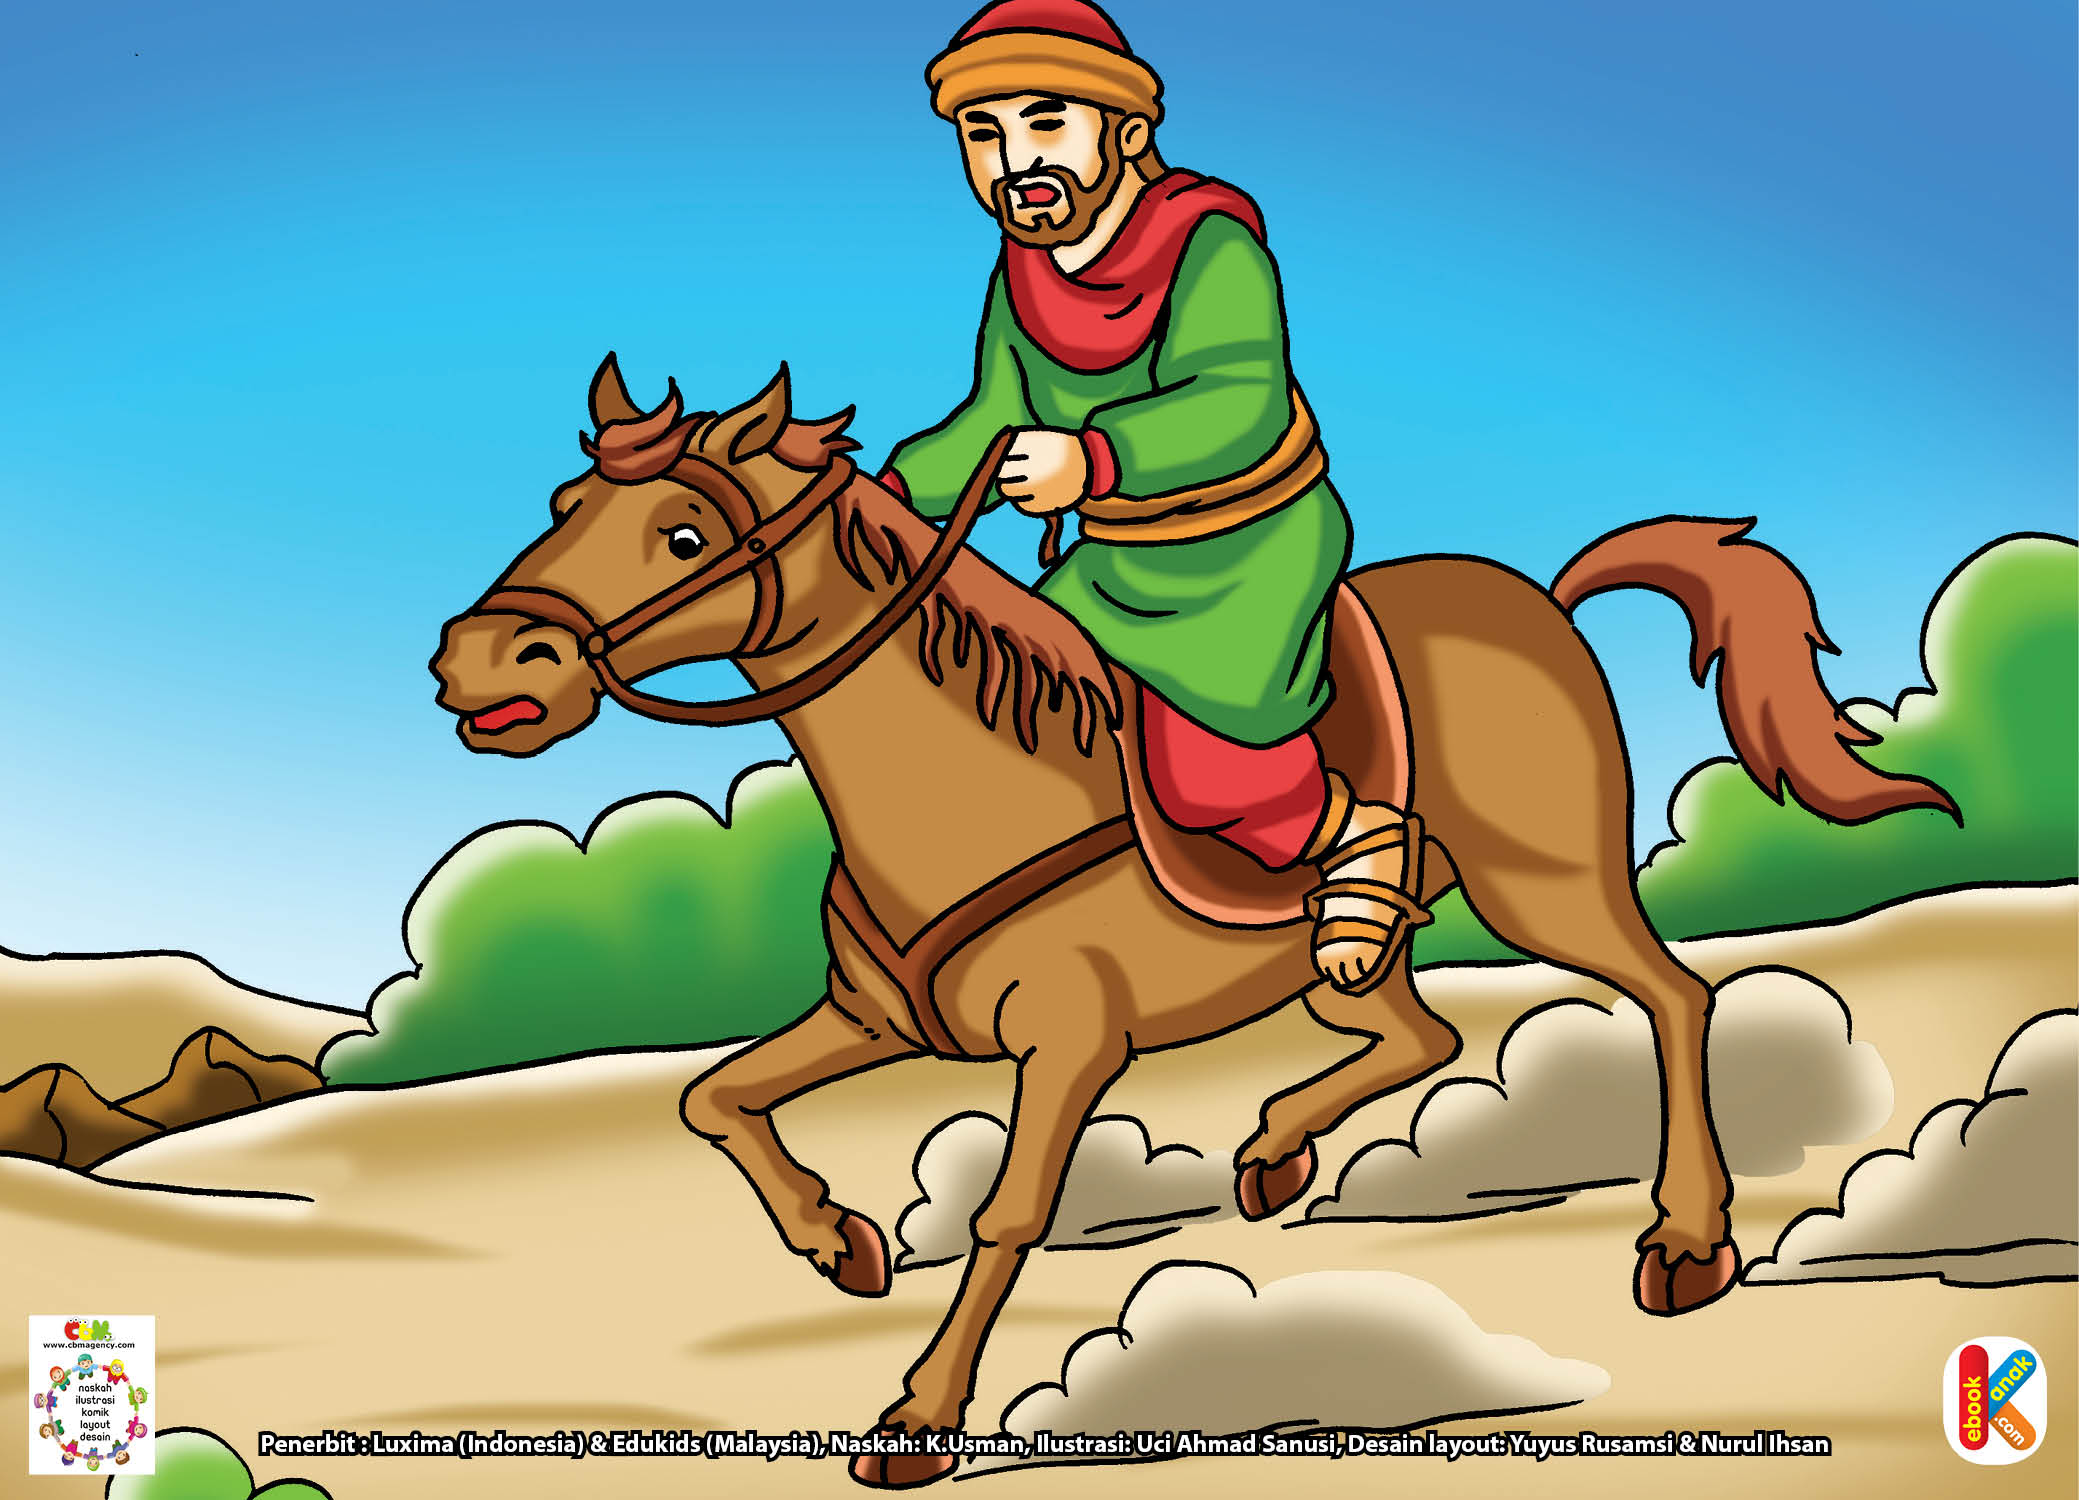 Muka Abu Bakar menunjukkan kecemasan.